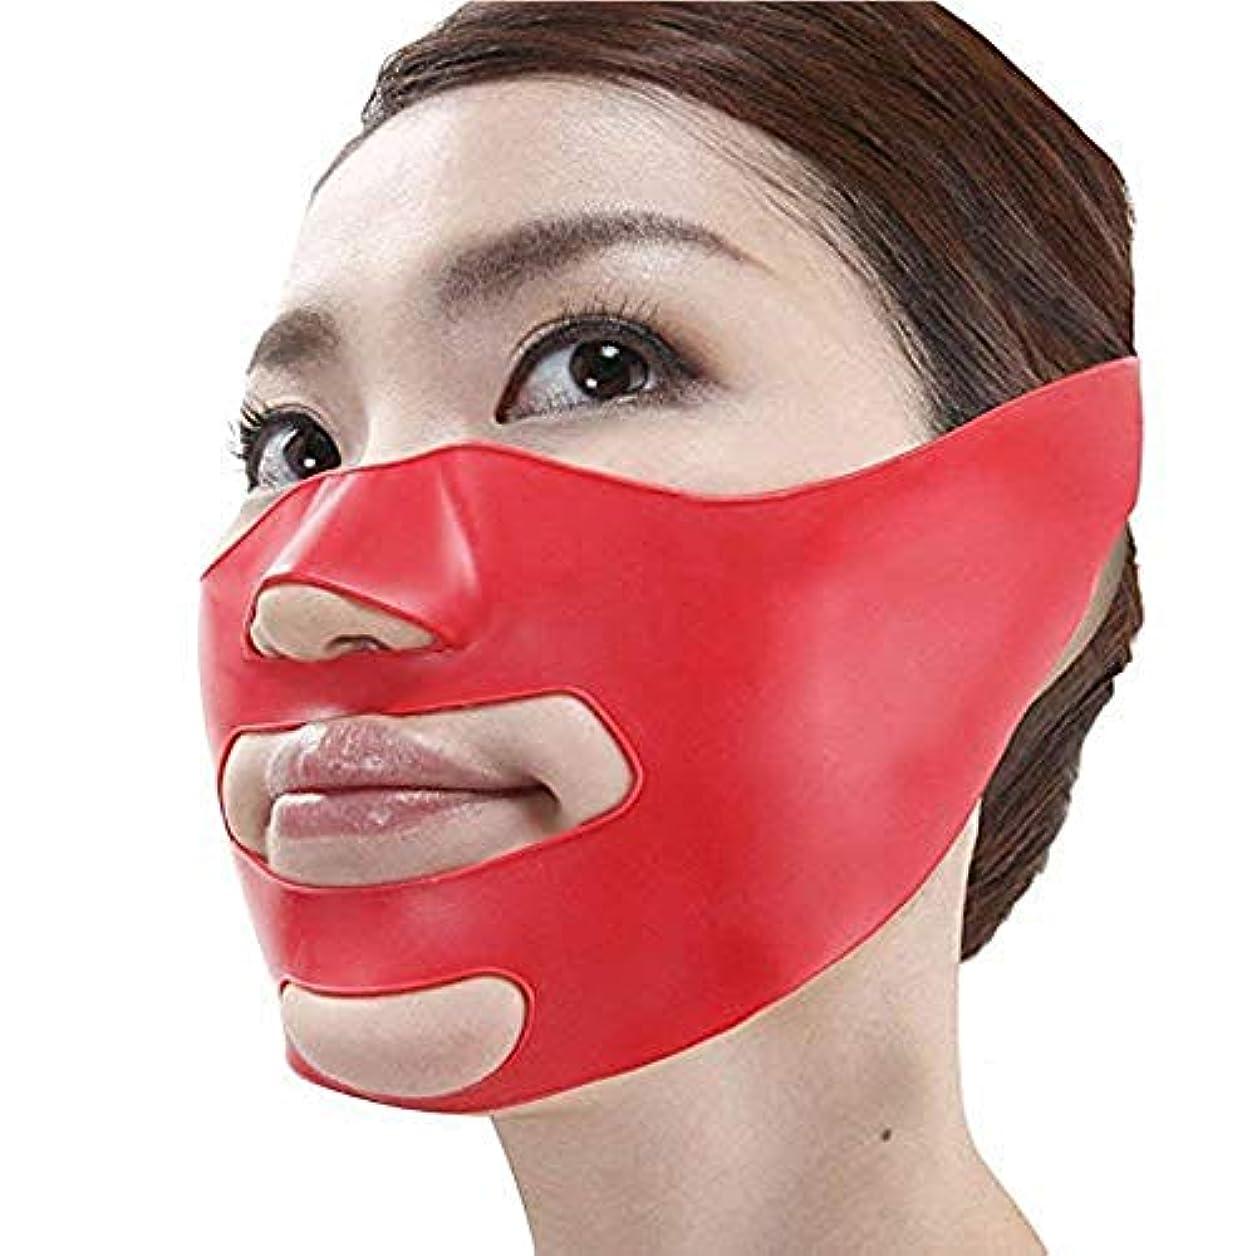 Lindexs 小顔矯正 マスク 小顔補正ベルト ほうれい線 3Dエクササイズマスク リフトスリムマスク 抗シワ サウナマスク 法令線予防 美容グッ (フリーサイズ)